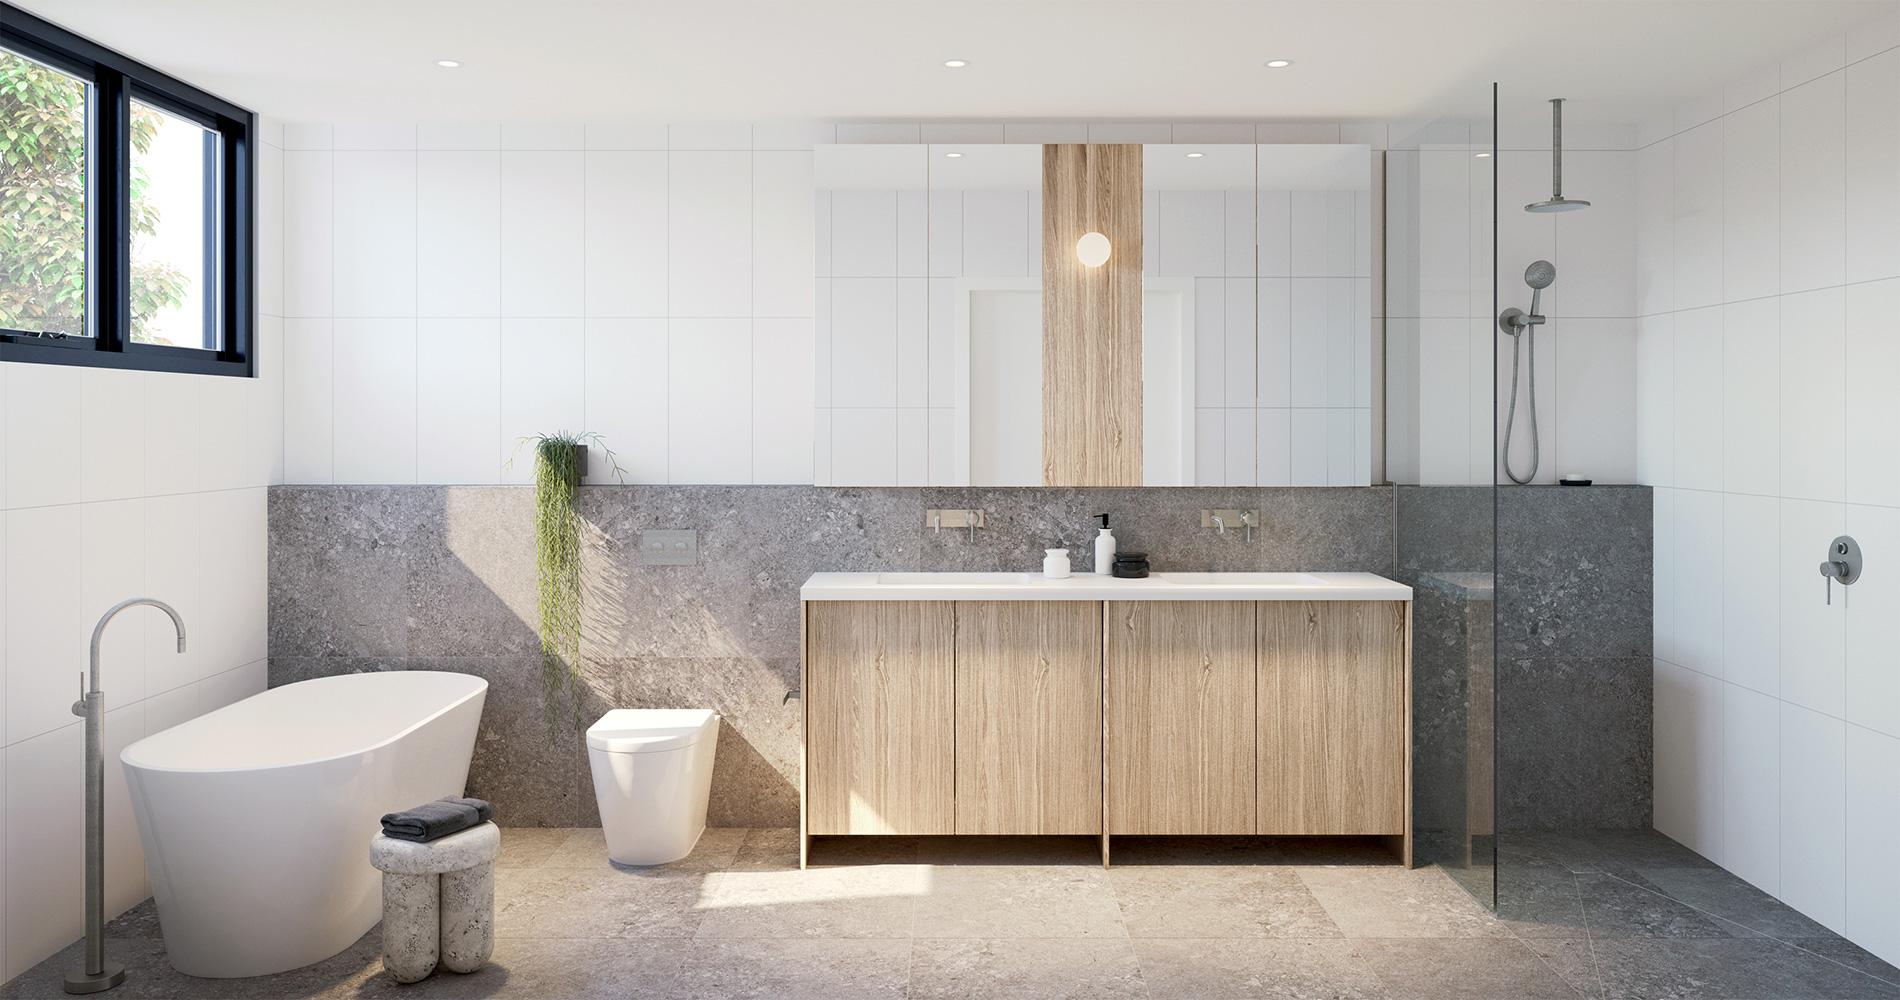 balwyn-townhouses-c.kairouz-architects-bathroom-interior-design